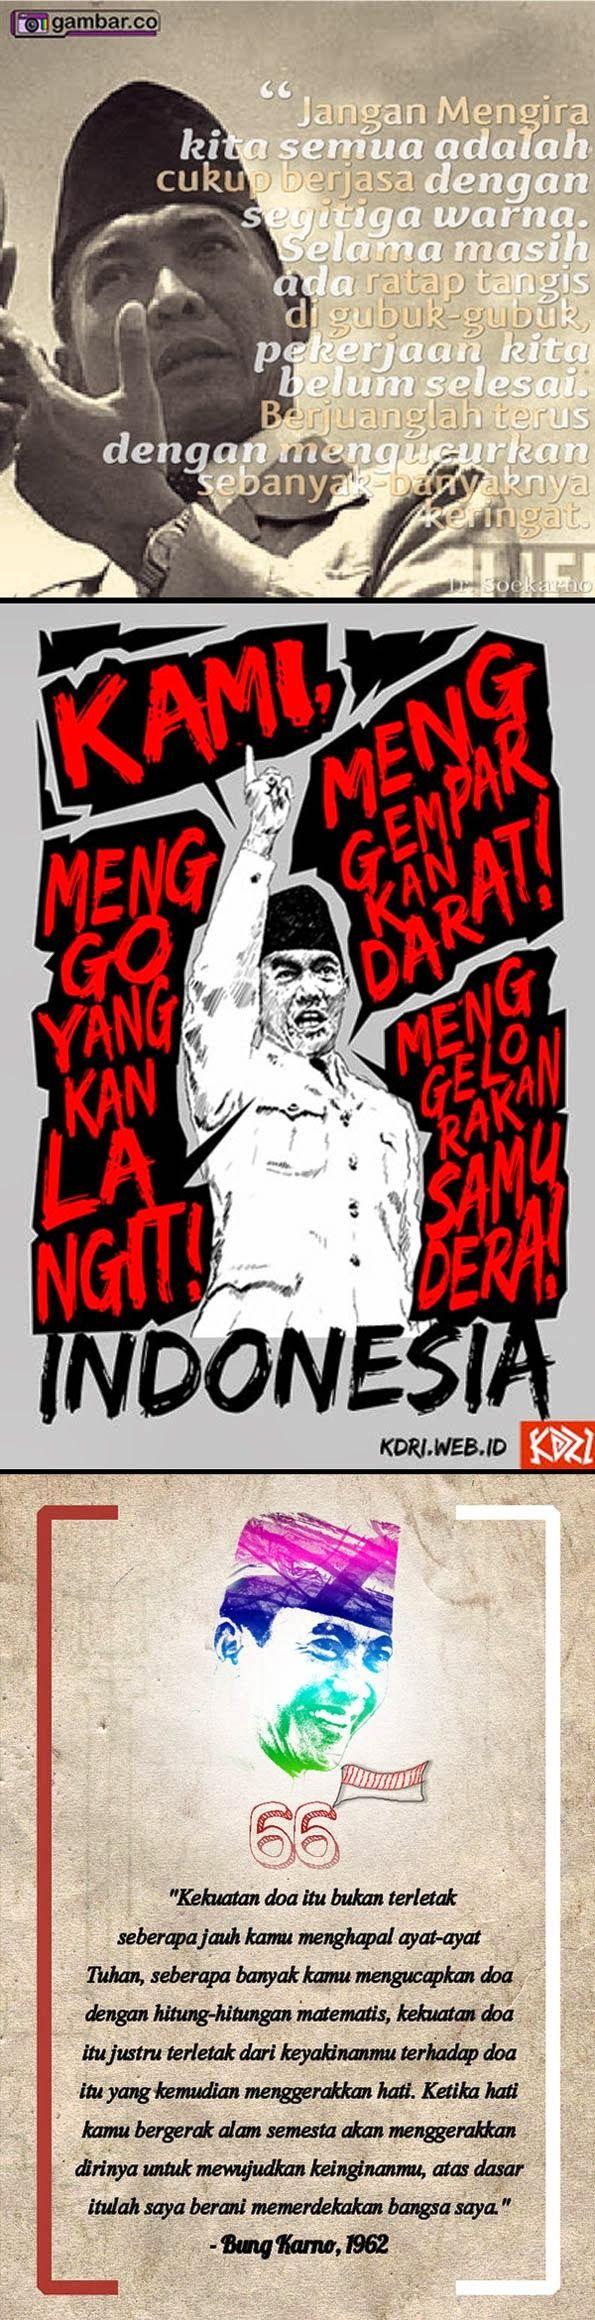 Quotes Soekarno Hari Pahlawan